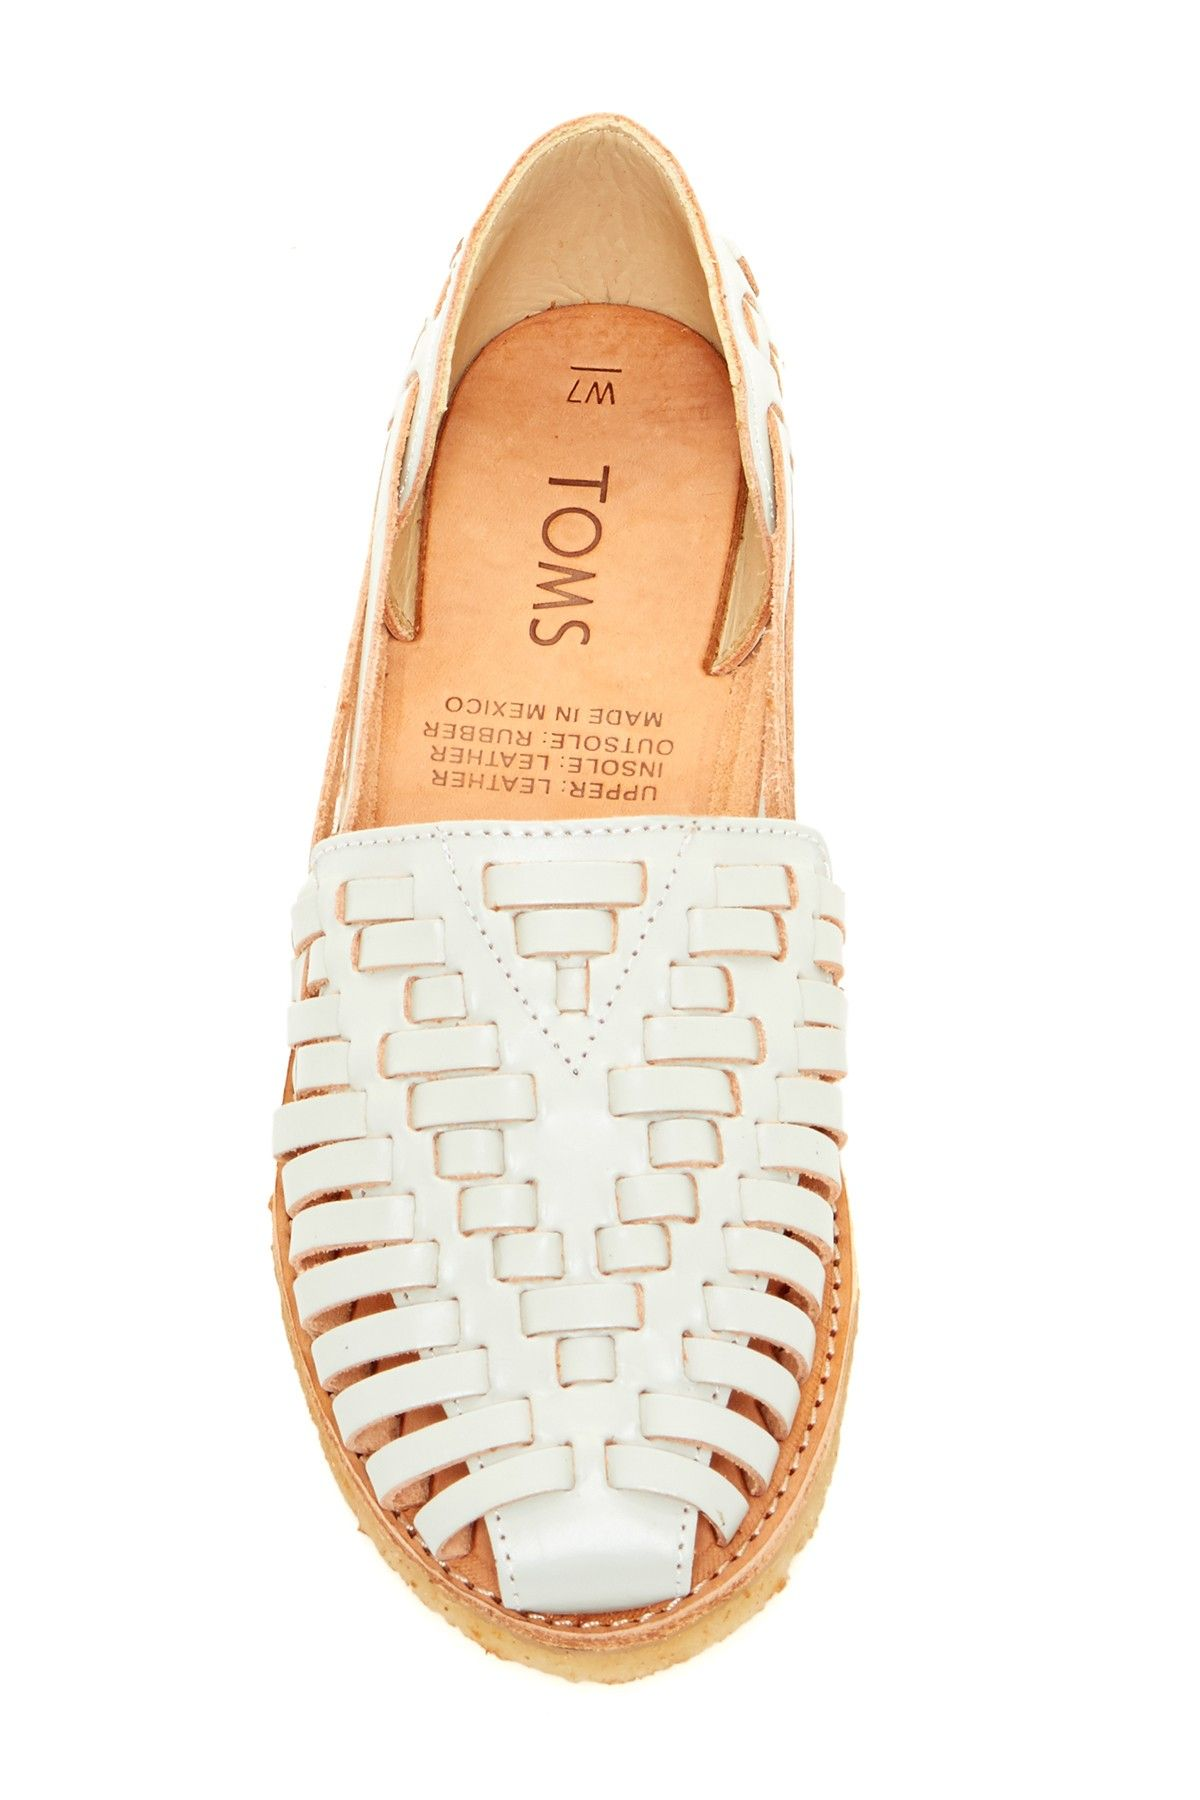 0ba8c1203c28 Perfect summer sandal. TOMS Huarache Slip-Ons